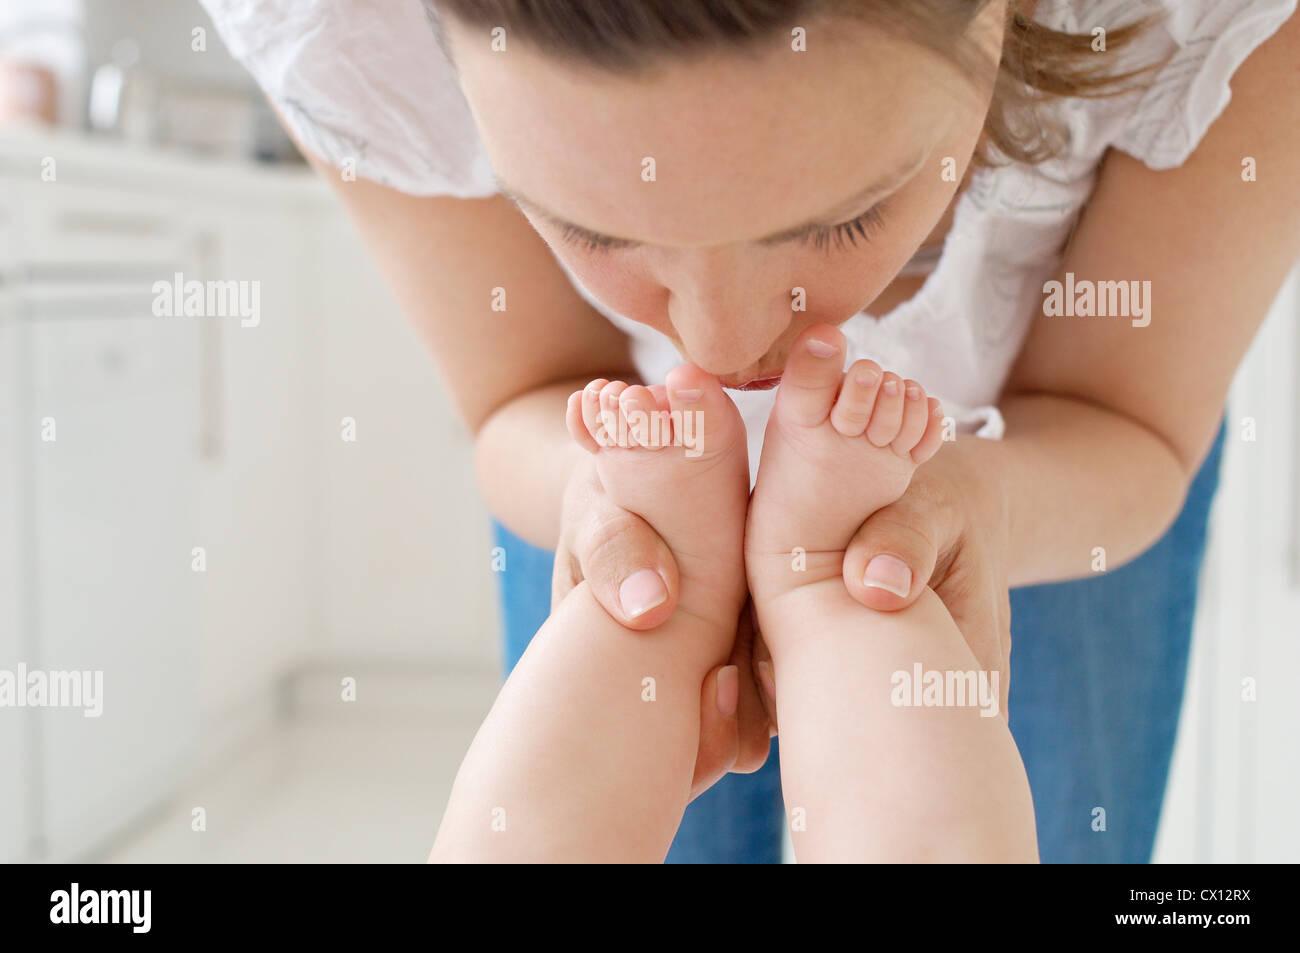 Mutter des Babys küssen Füße Stockbild